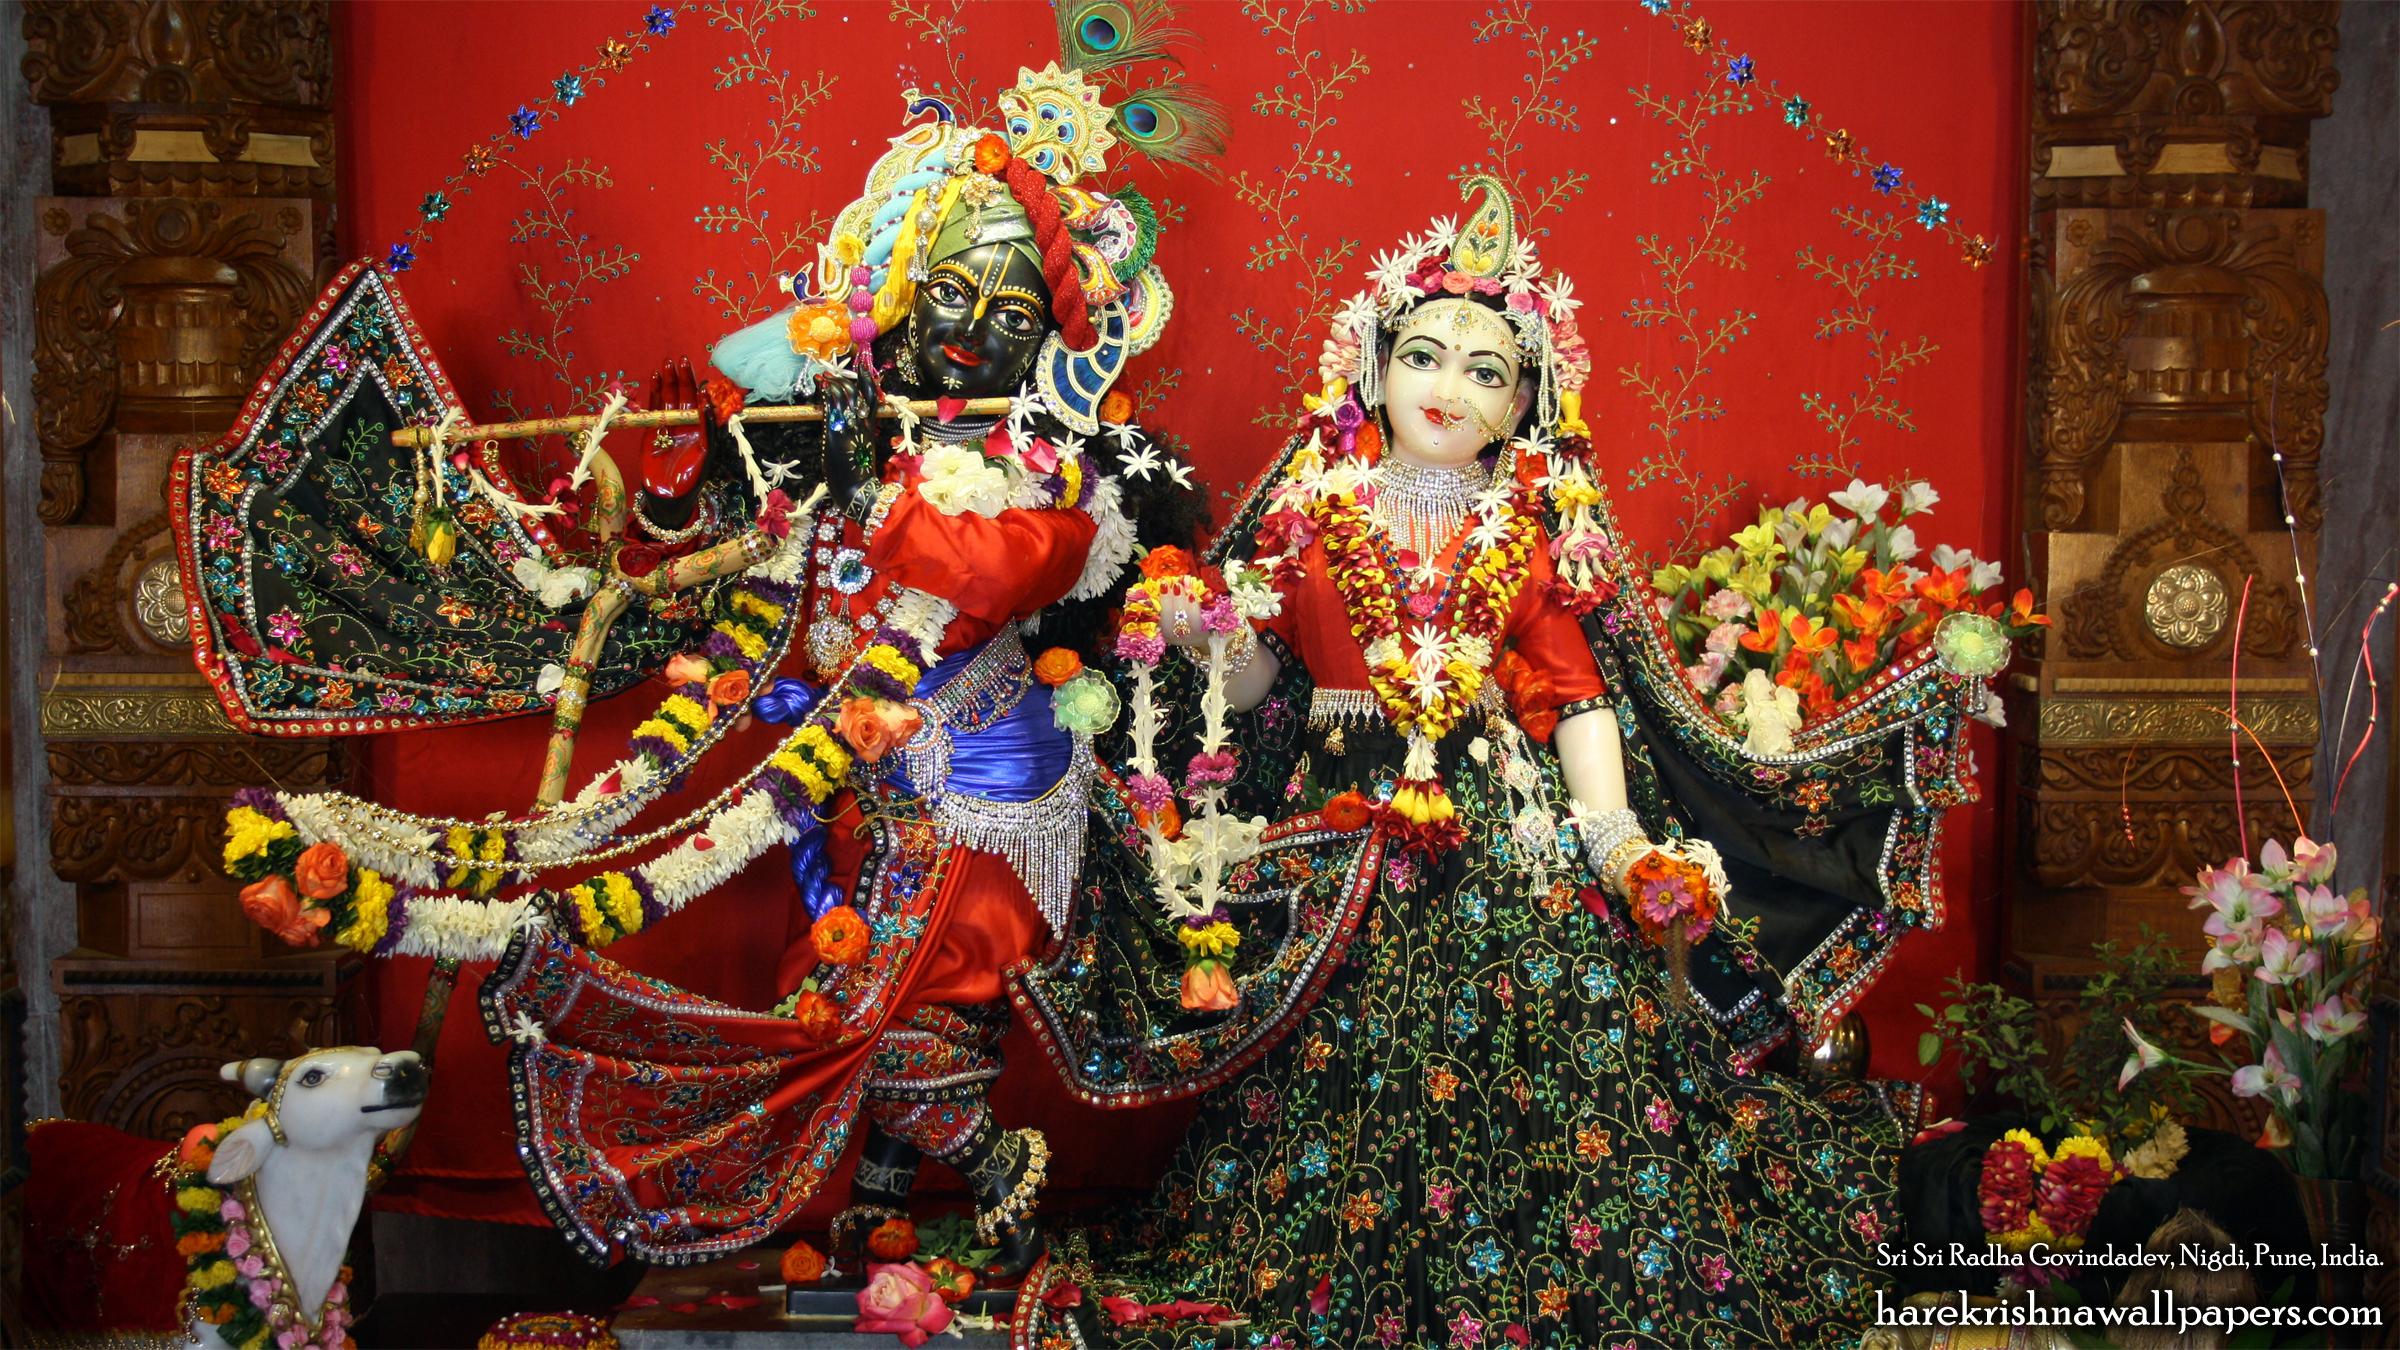 Sri Sri Radha Govind Wallpaper (042) Size 2400x1350 Download